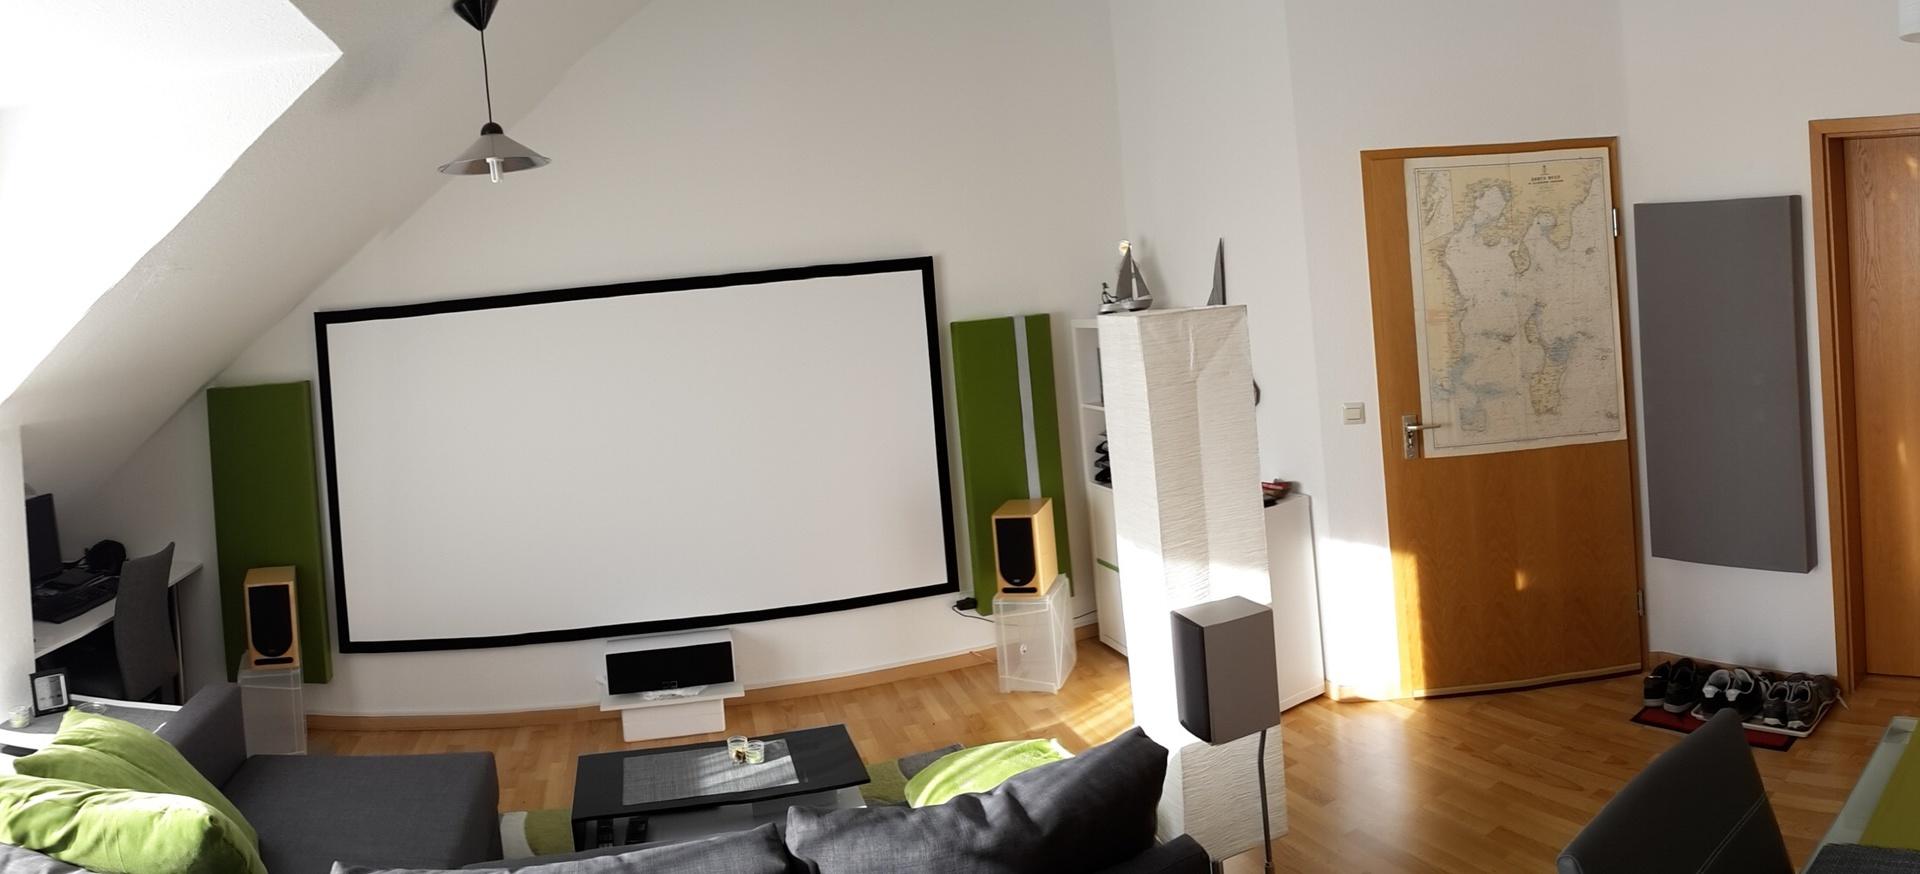 Wohnzimmer Akustik